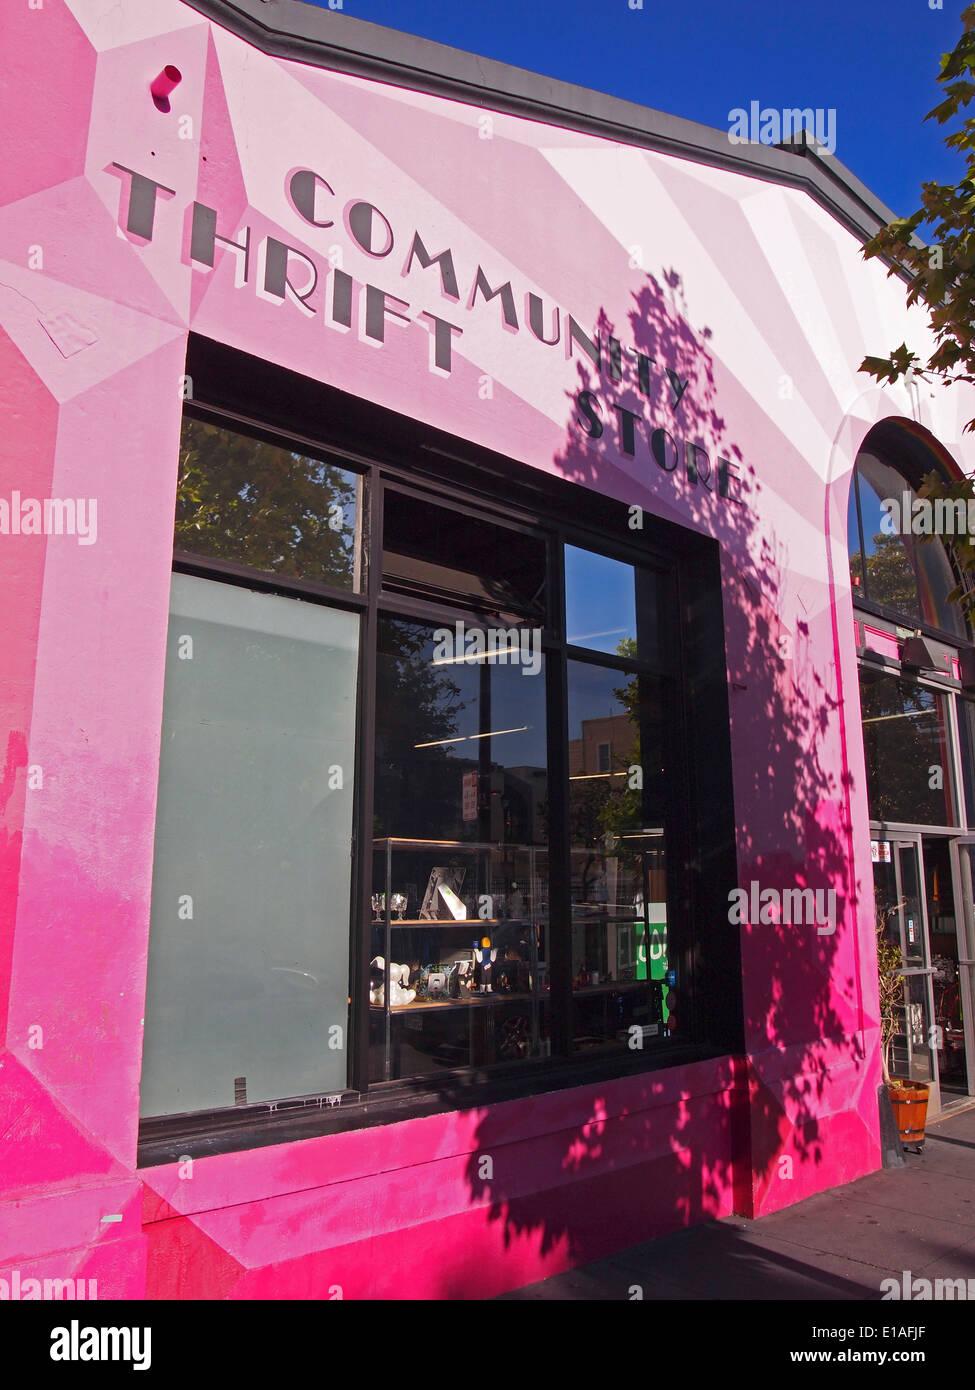 Community Thrift Store on Valencia Street San Francisco - Stock Image